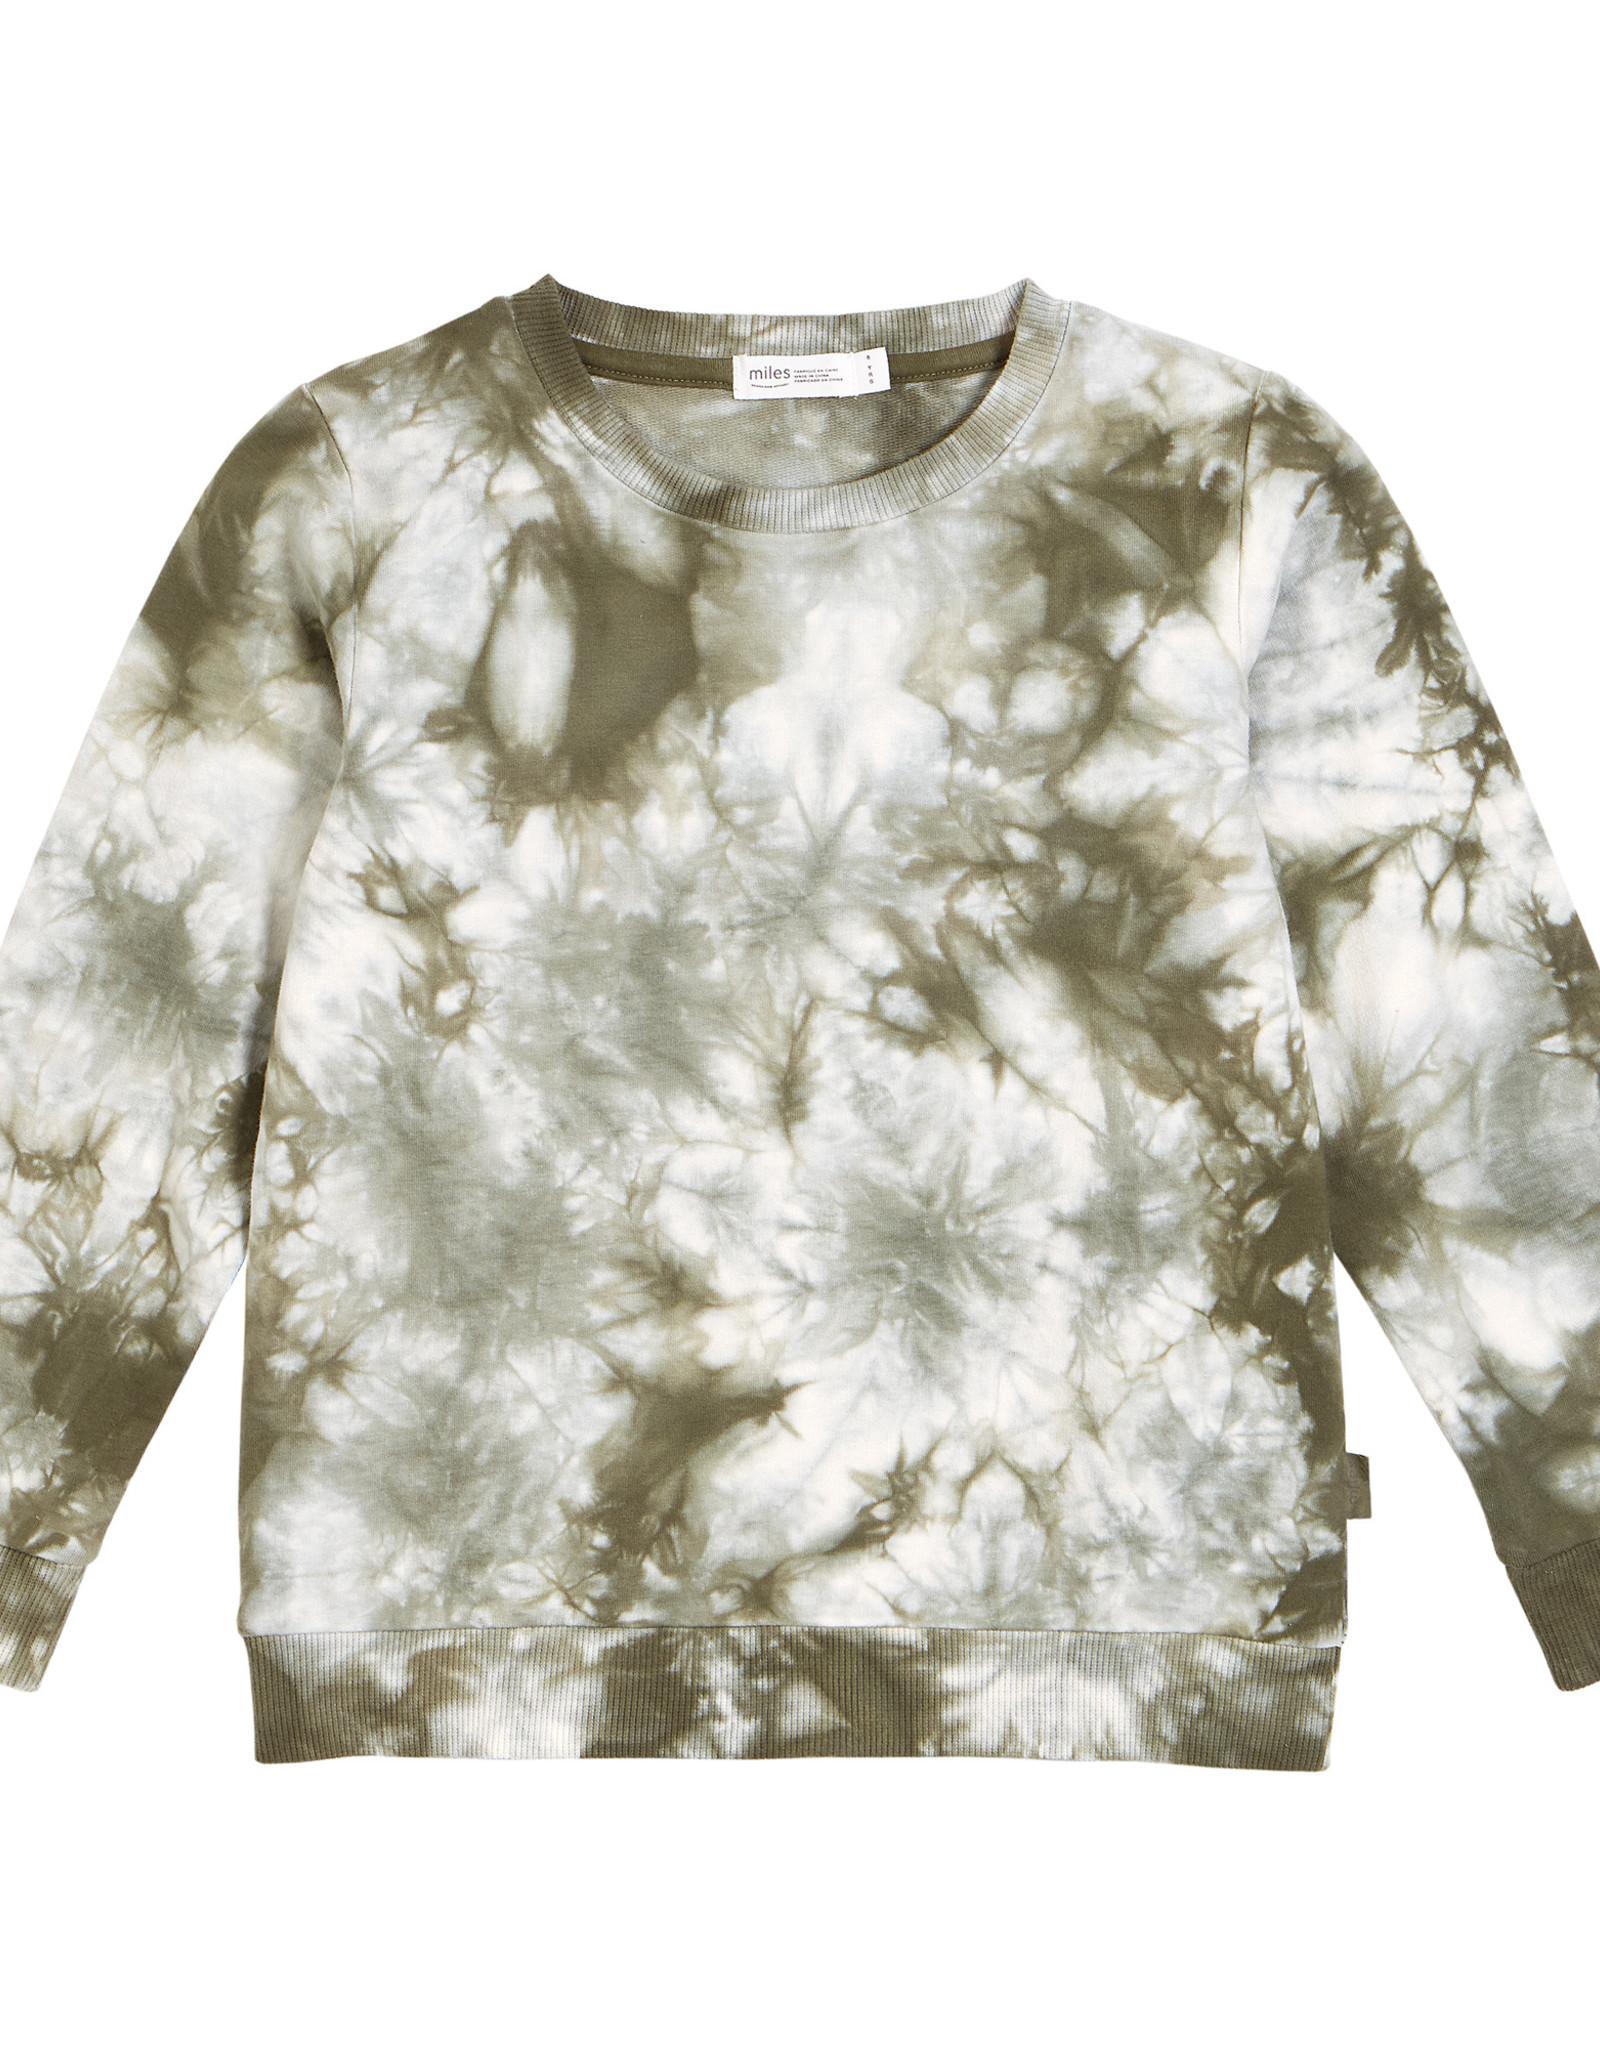 Miles Baby Tie-dye sweater